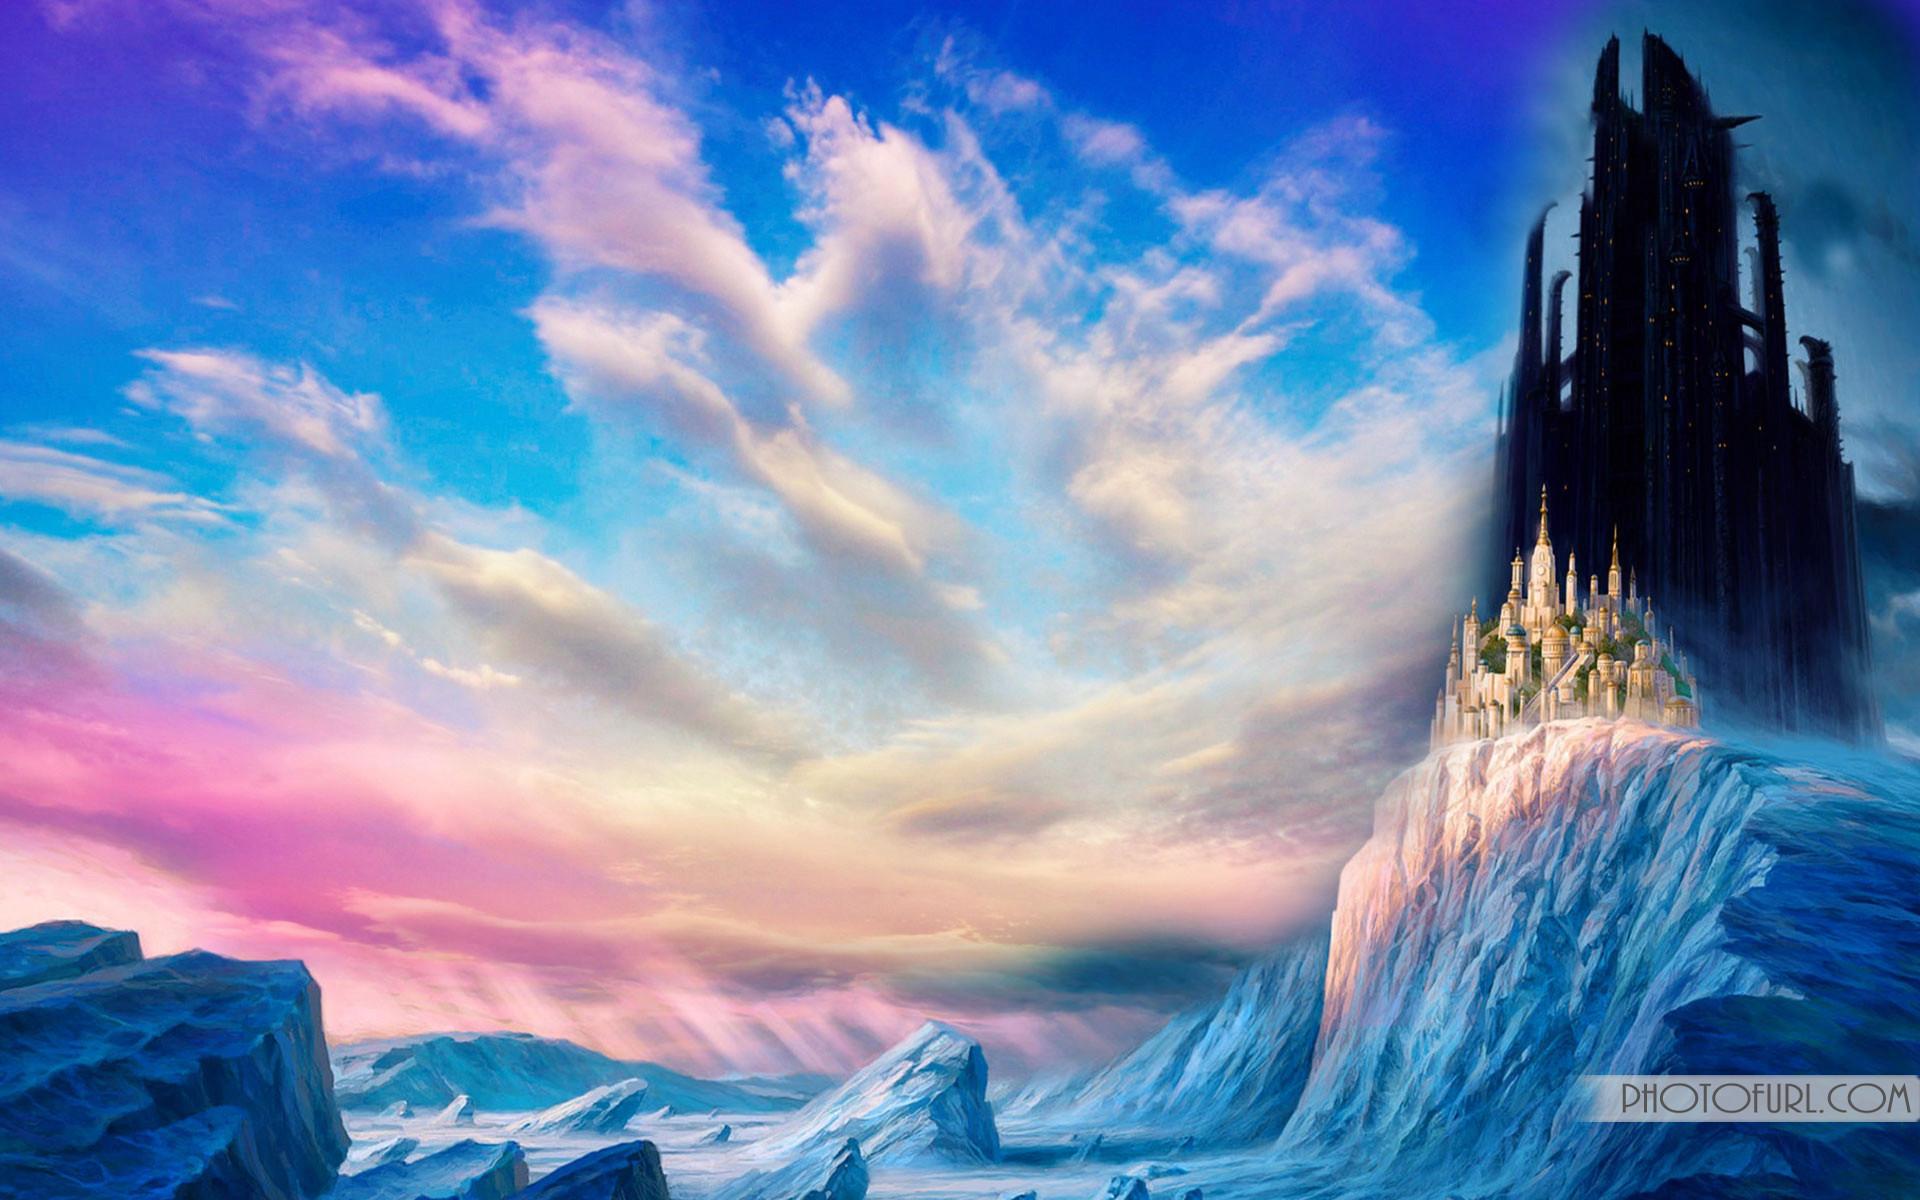 Beautiful 3d Animated Screensaver And Desktop Wallpaper Backgrounds